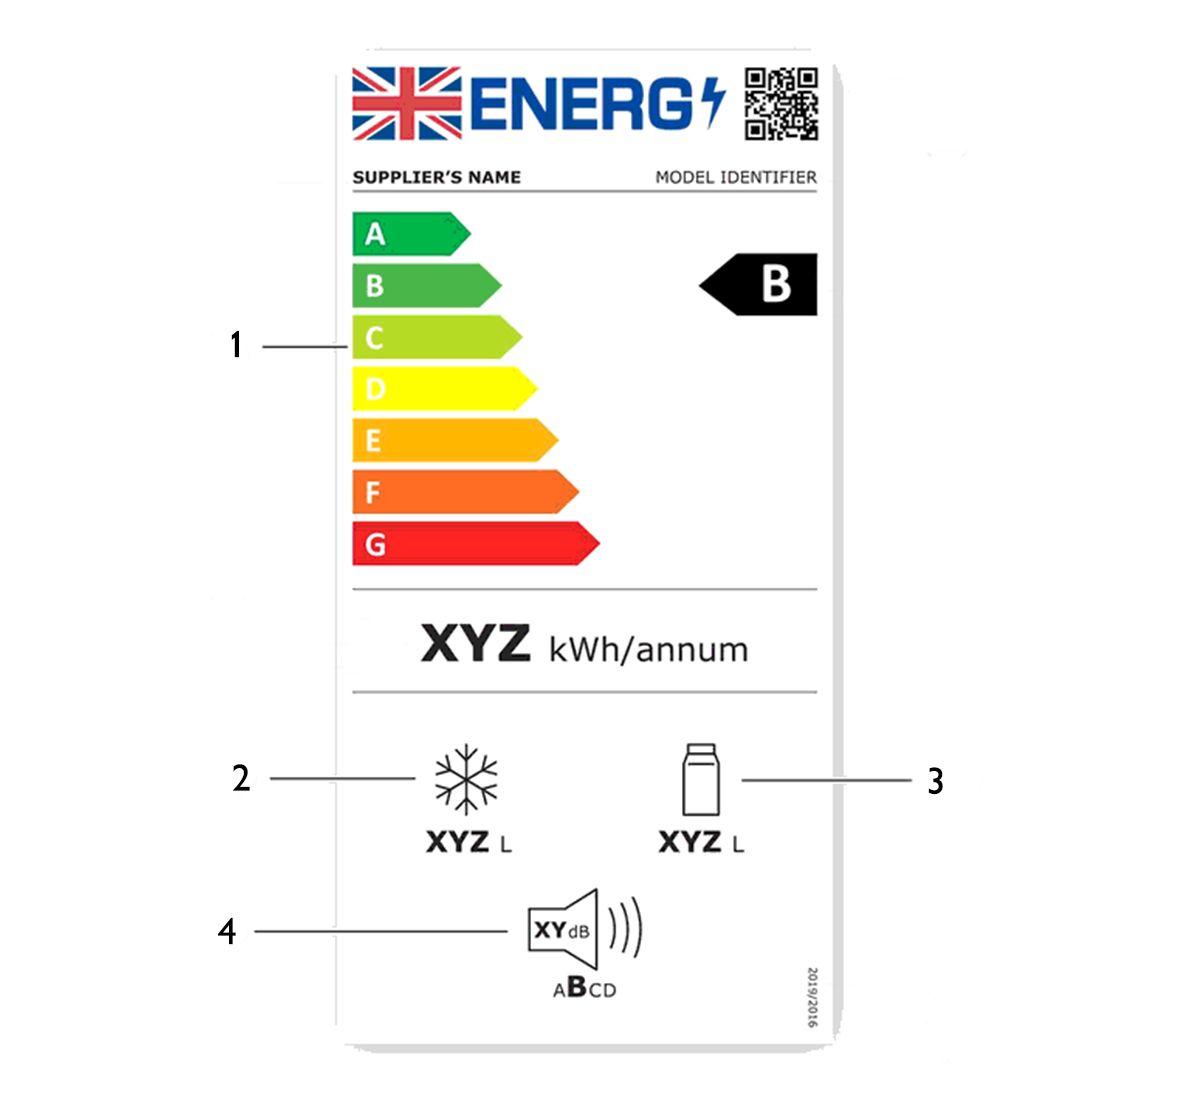 fridge freezer energy label